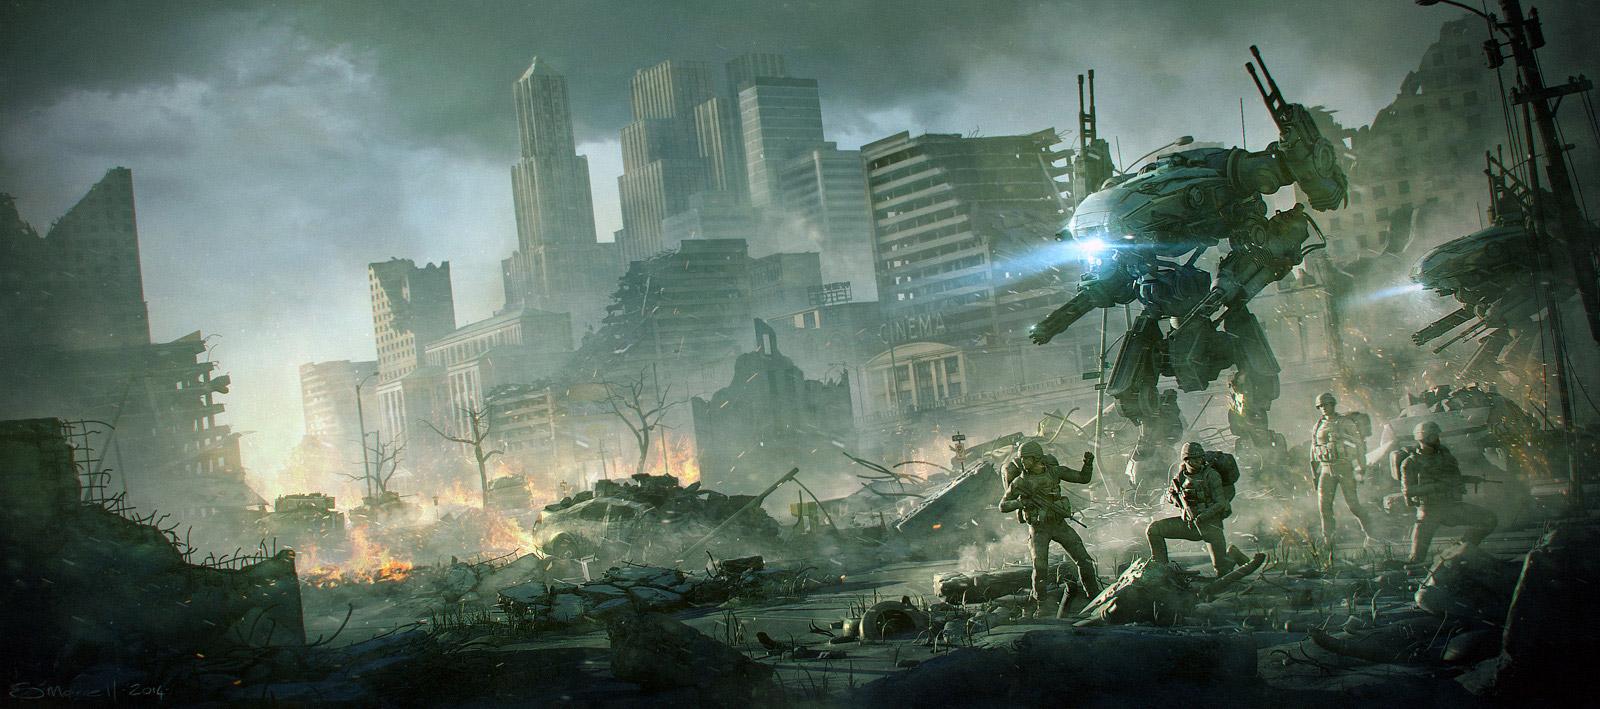 [GSU] Operation Omega Defense Sci-Fi-Art-Stefan-Morrell-City-Ruined